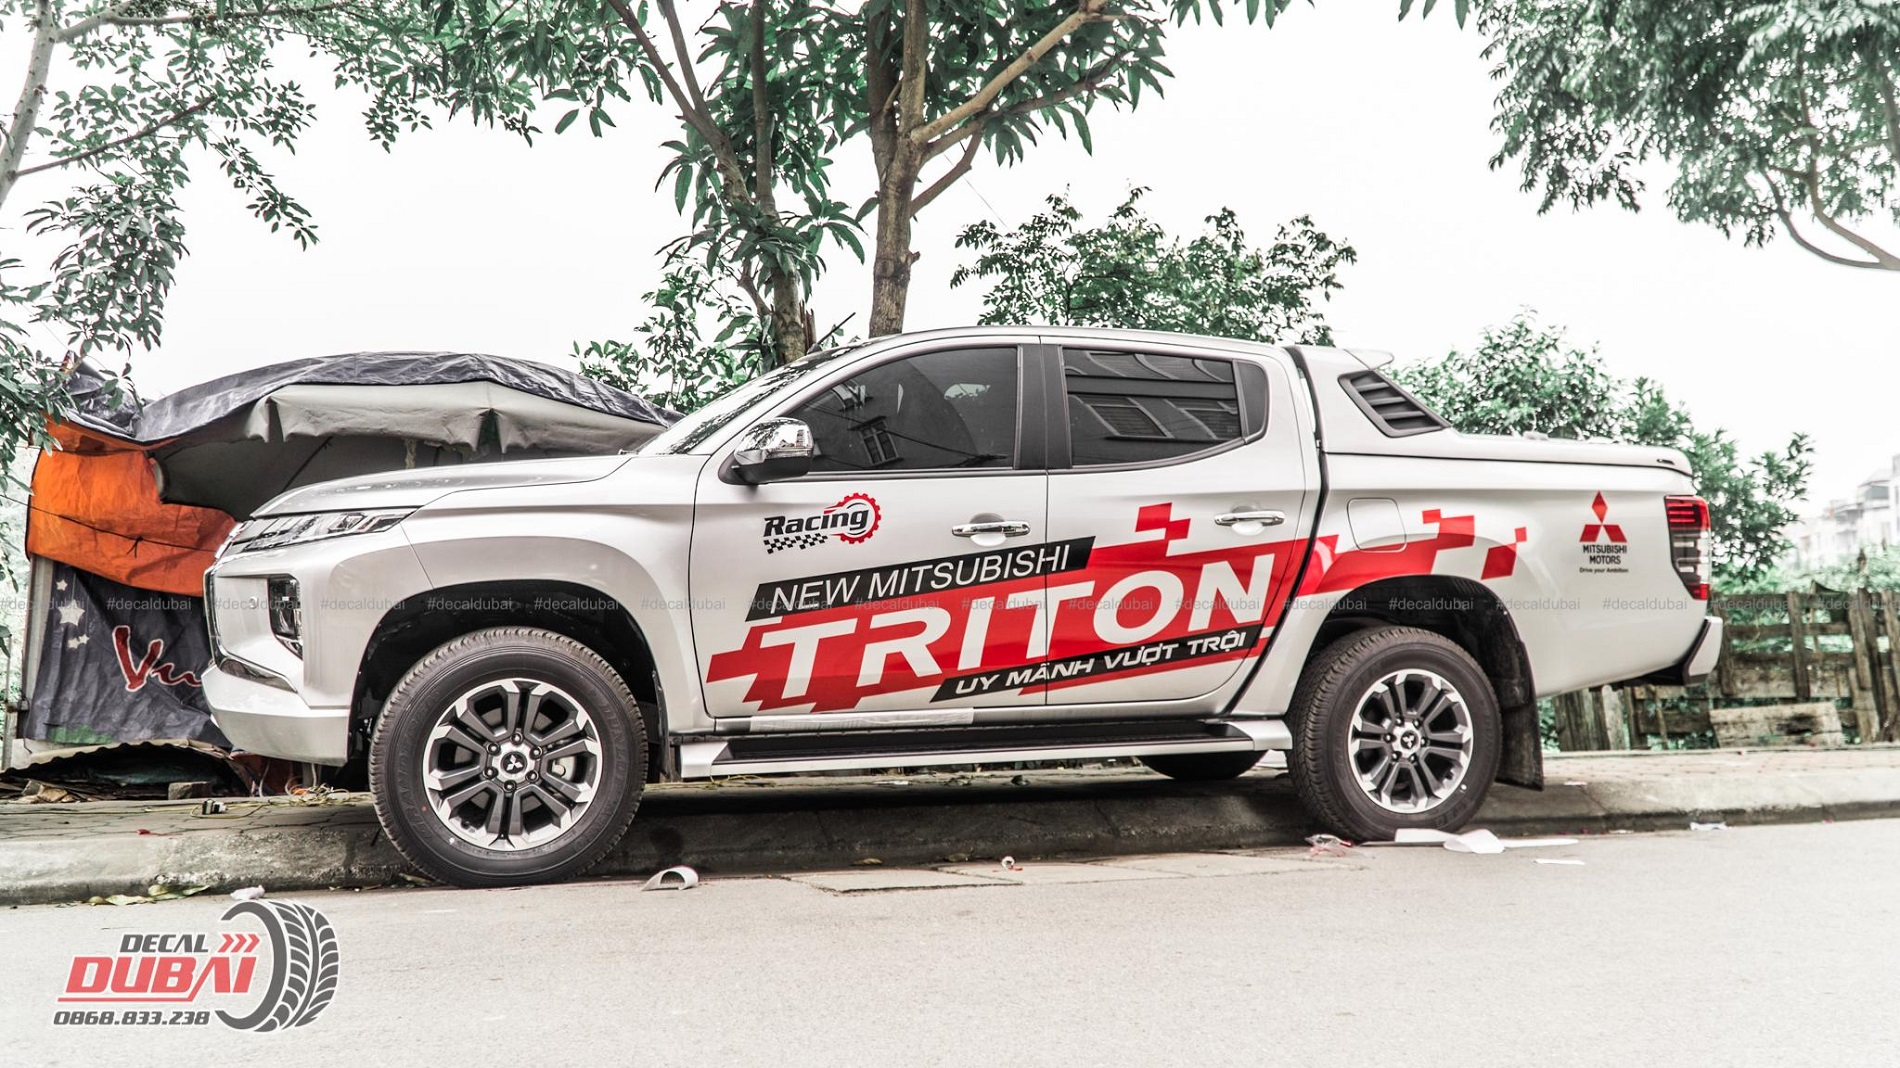 Tem xe Triton 0020 1150k